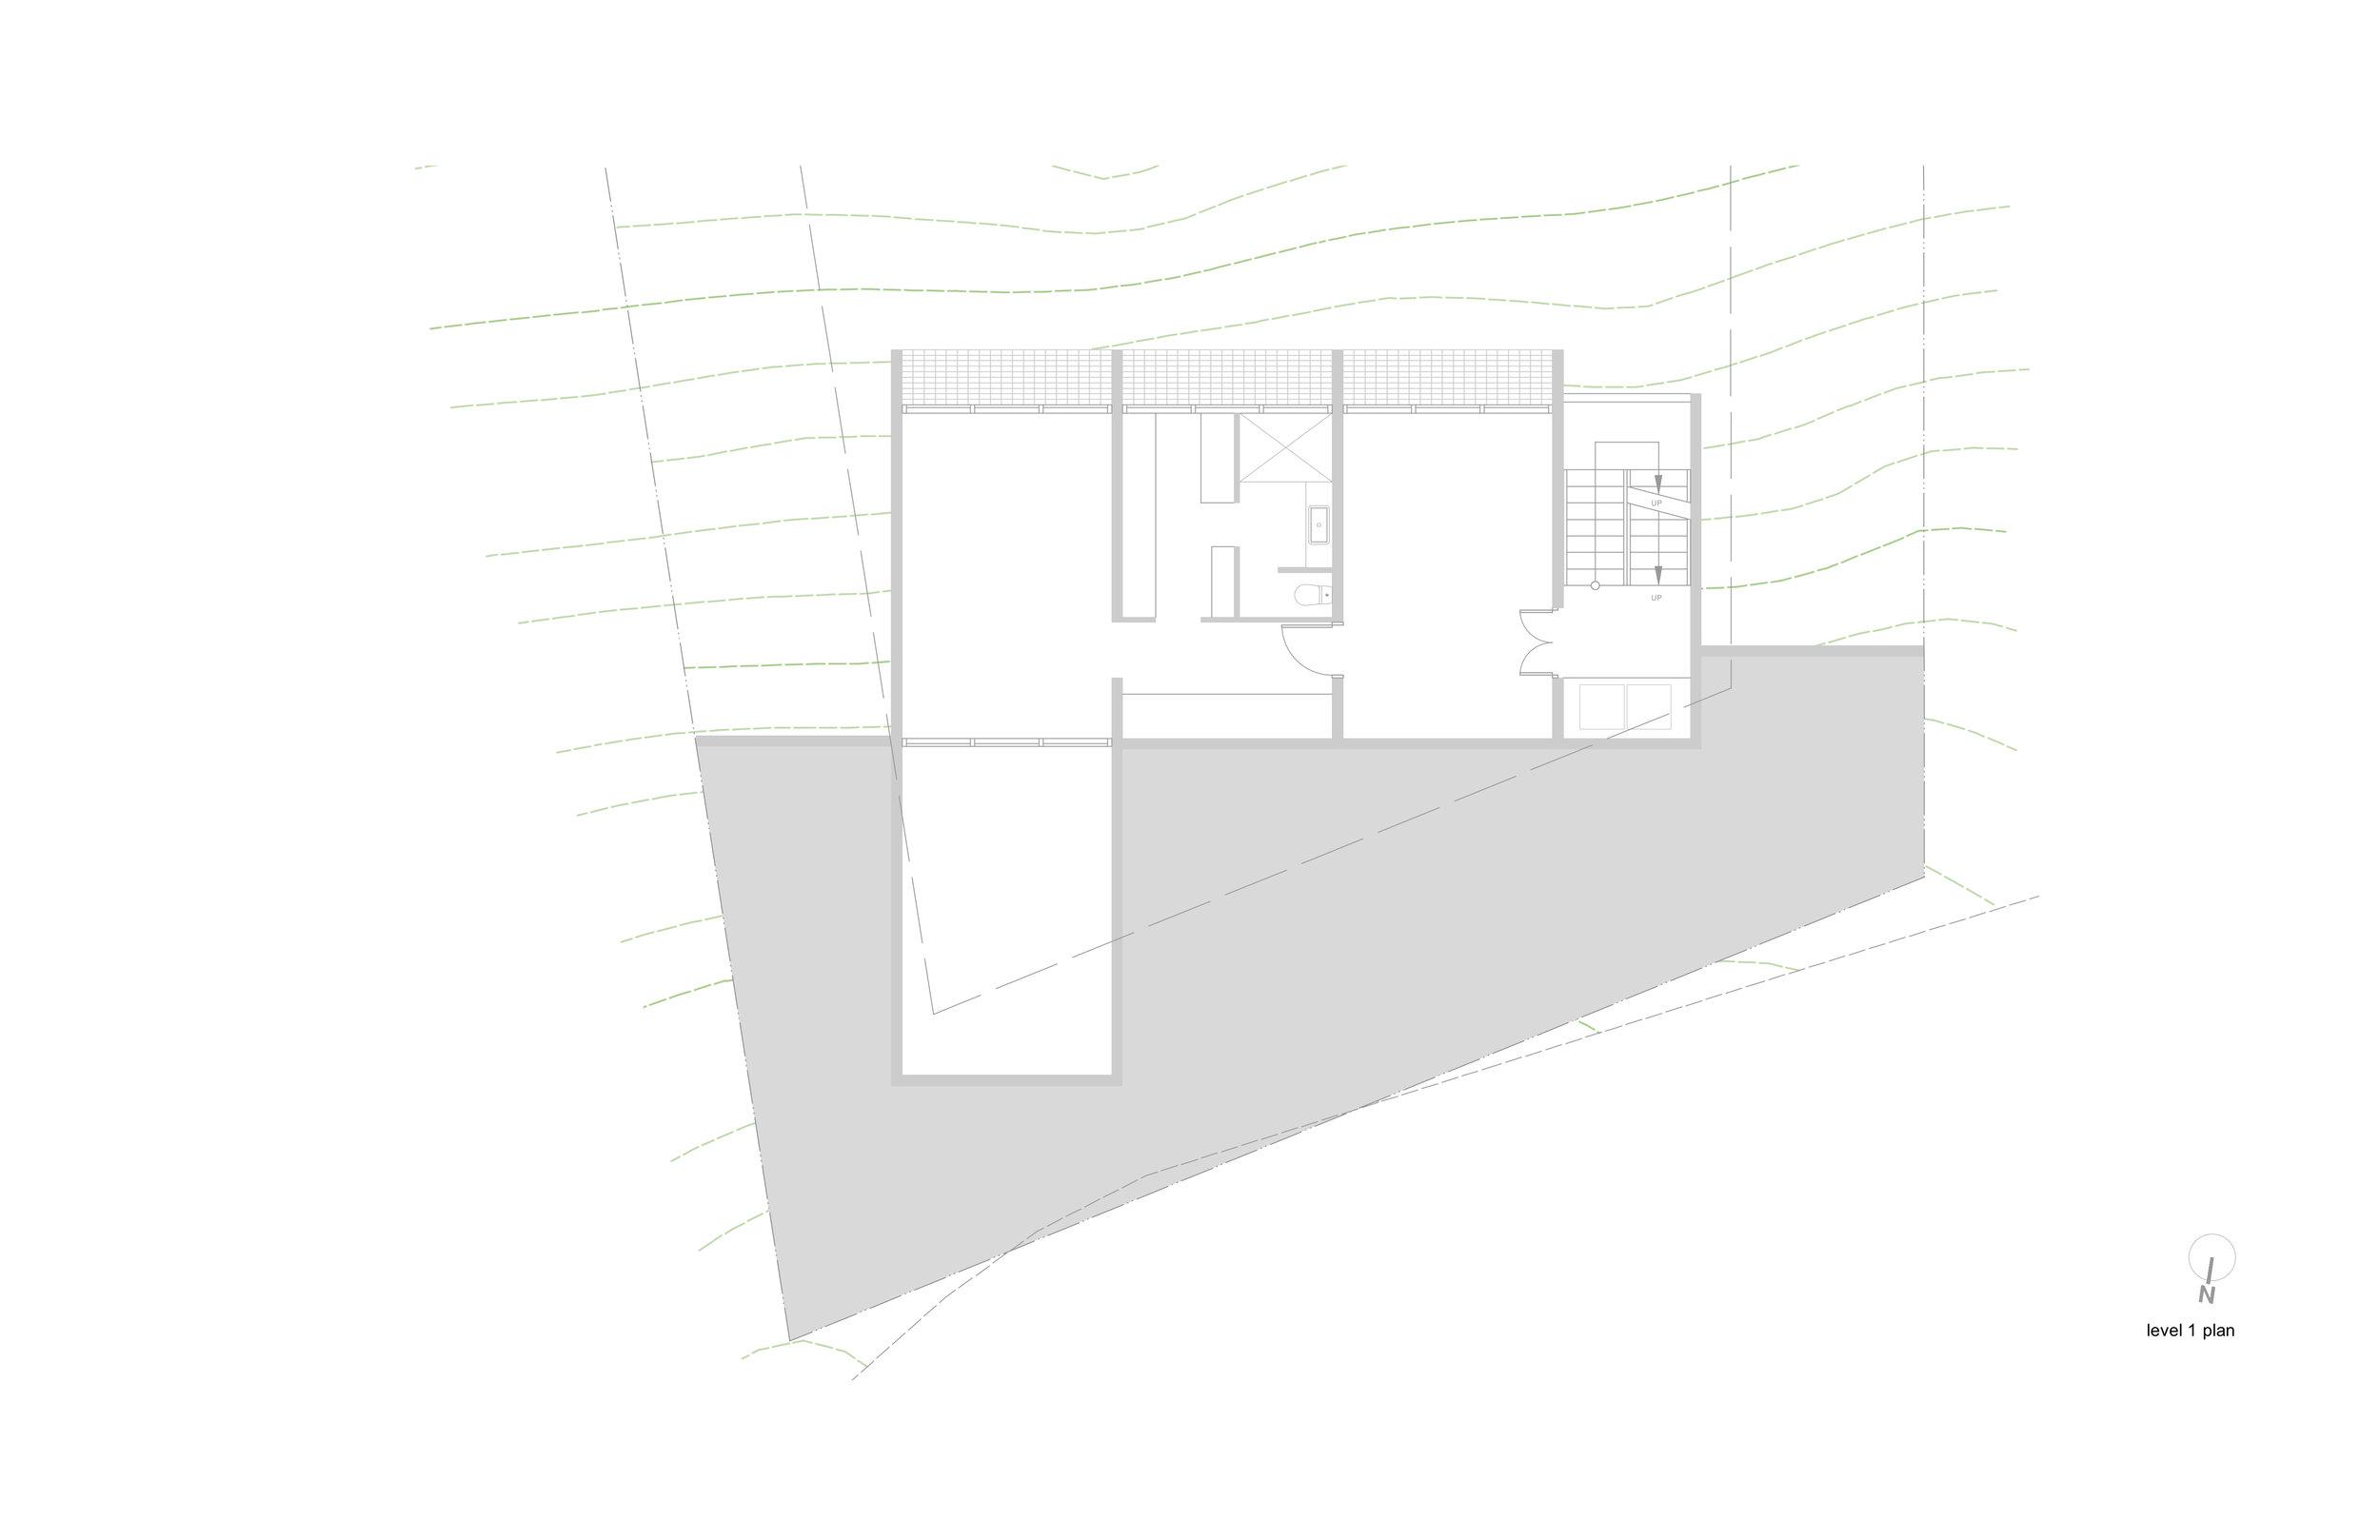 level 1 plan